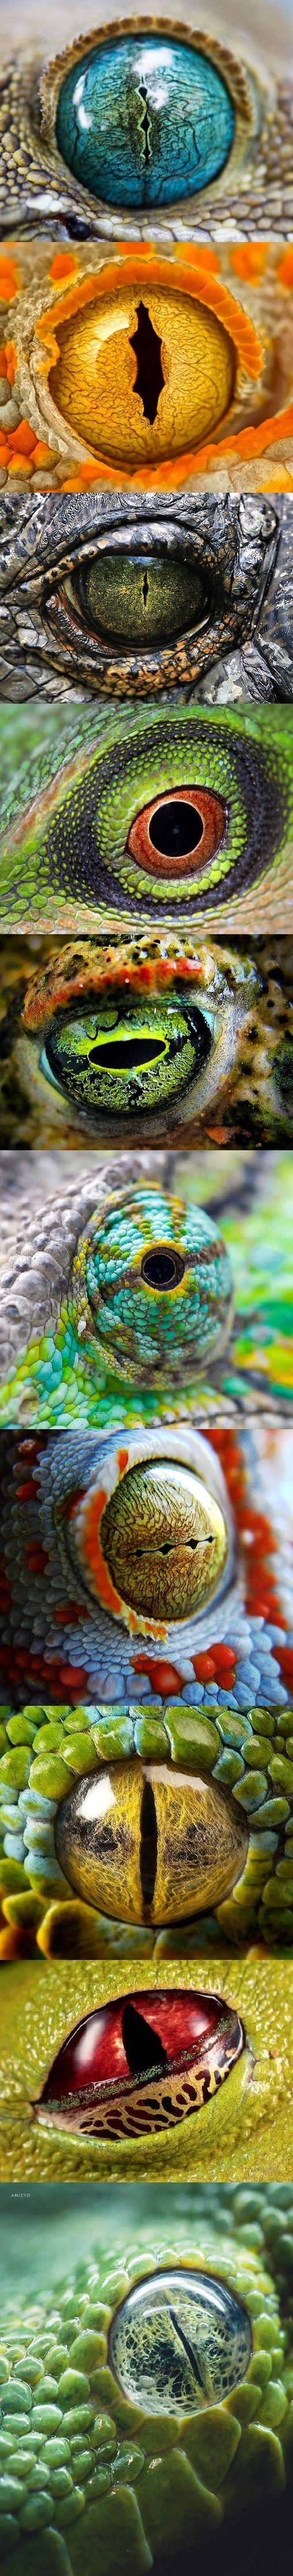 Reptile eyes...awesome!